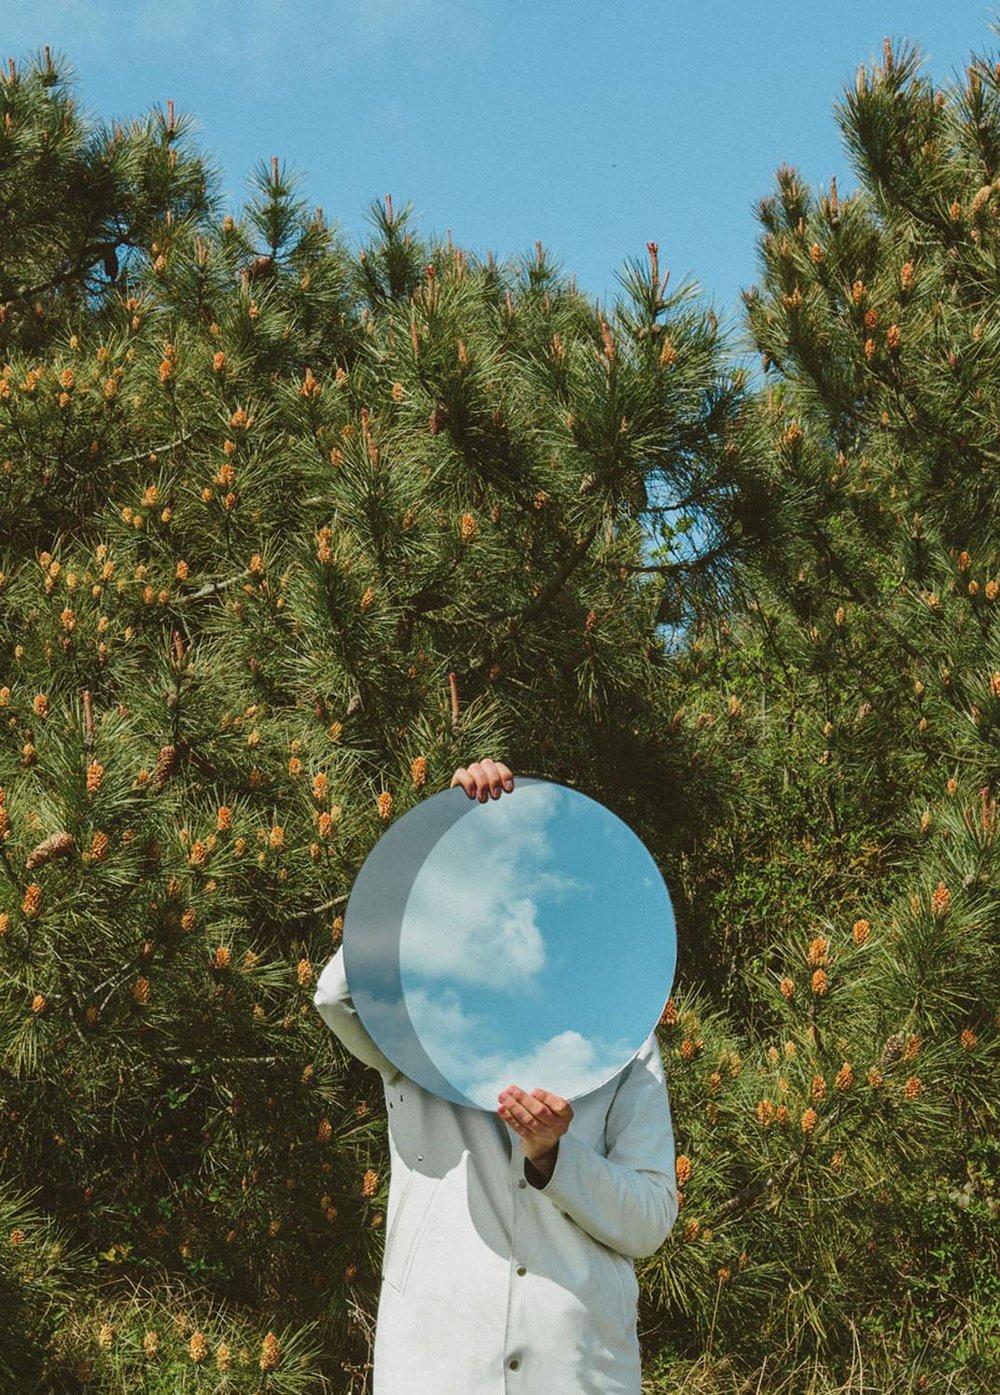 Mirror_slideshow_2_1.jpg